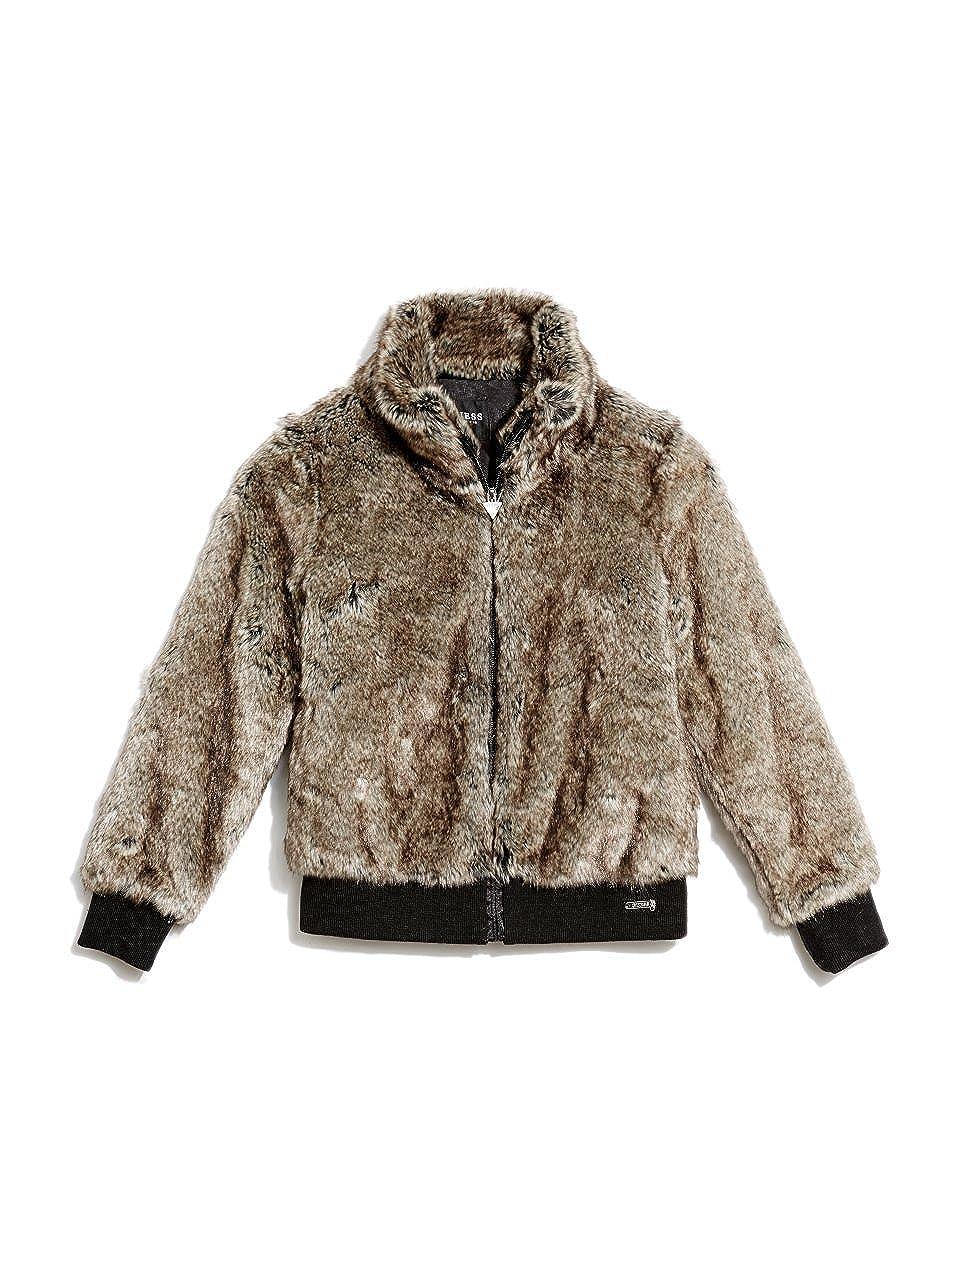 Turtle Dove Multi Guess Girls Big Faux-Fur Jacket 14